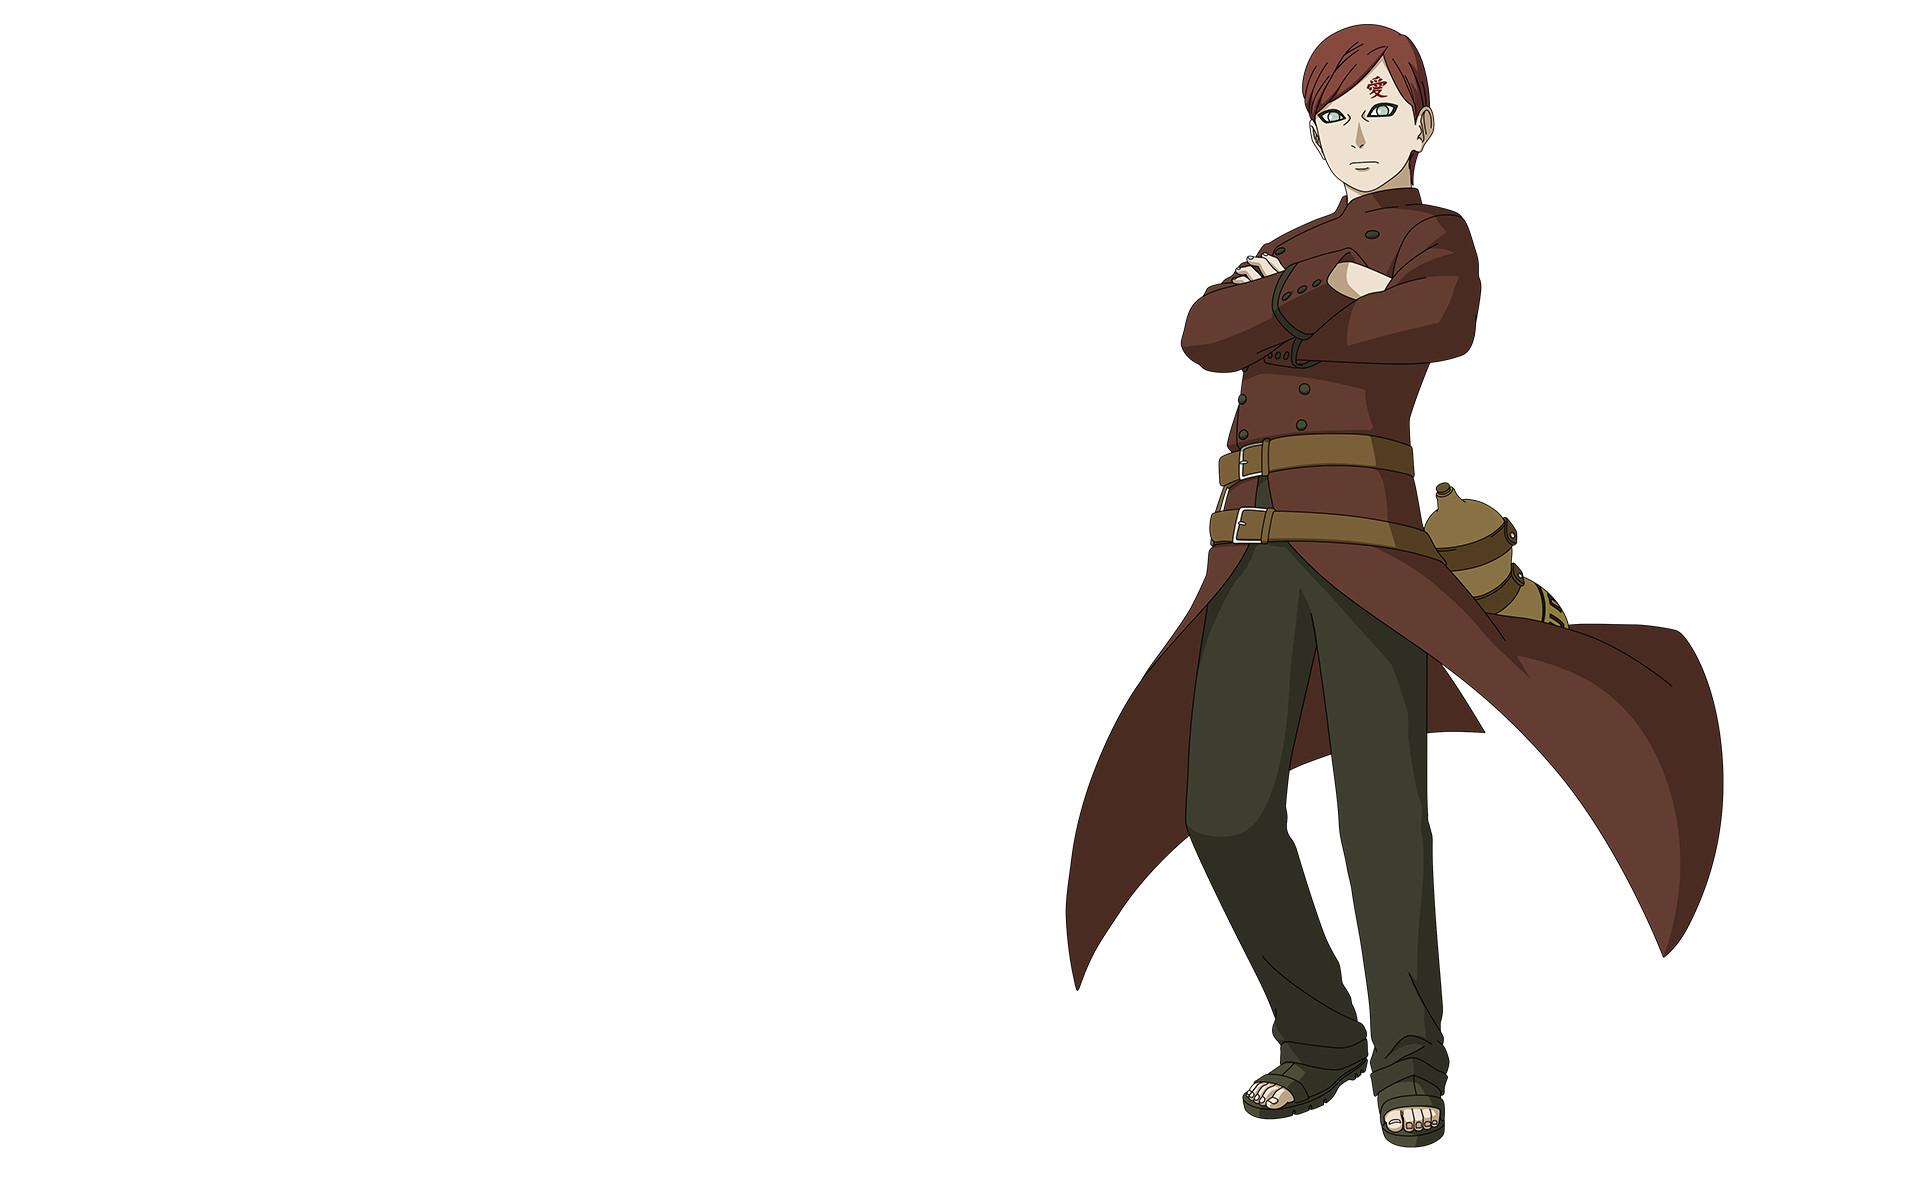 Anime – Boruto Gaara (Naruto) Wallpaper